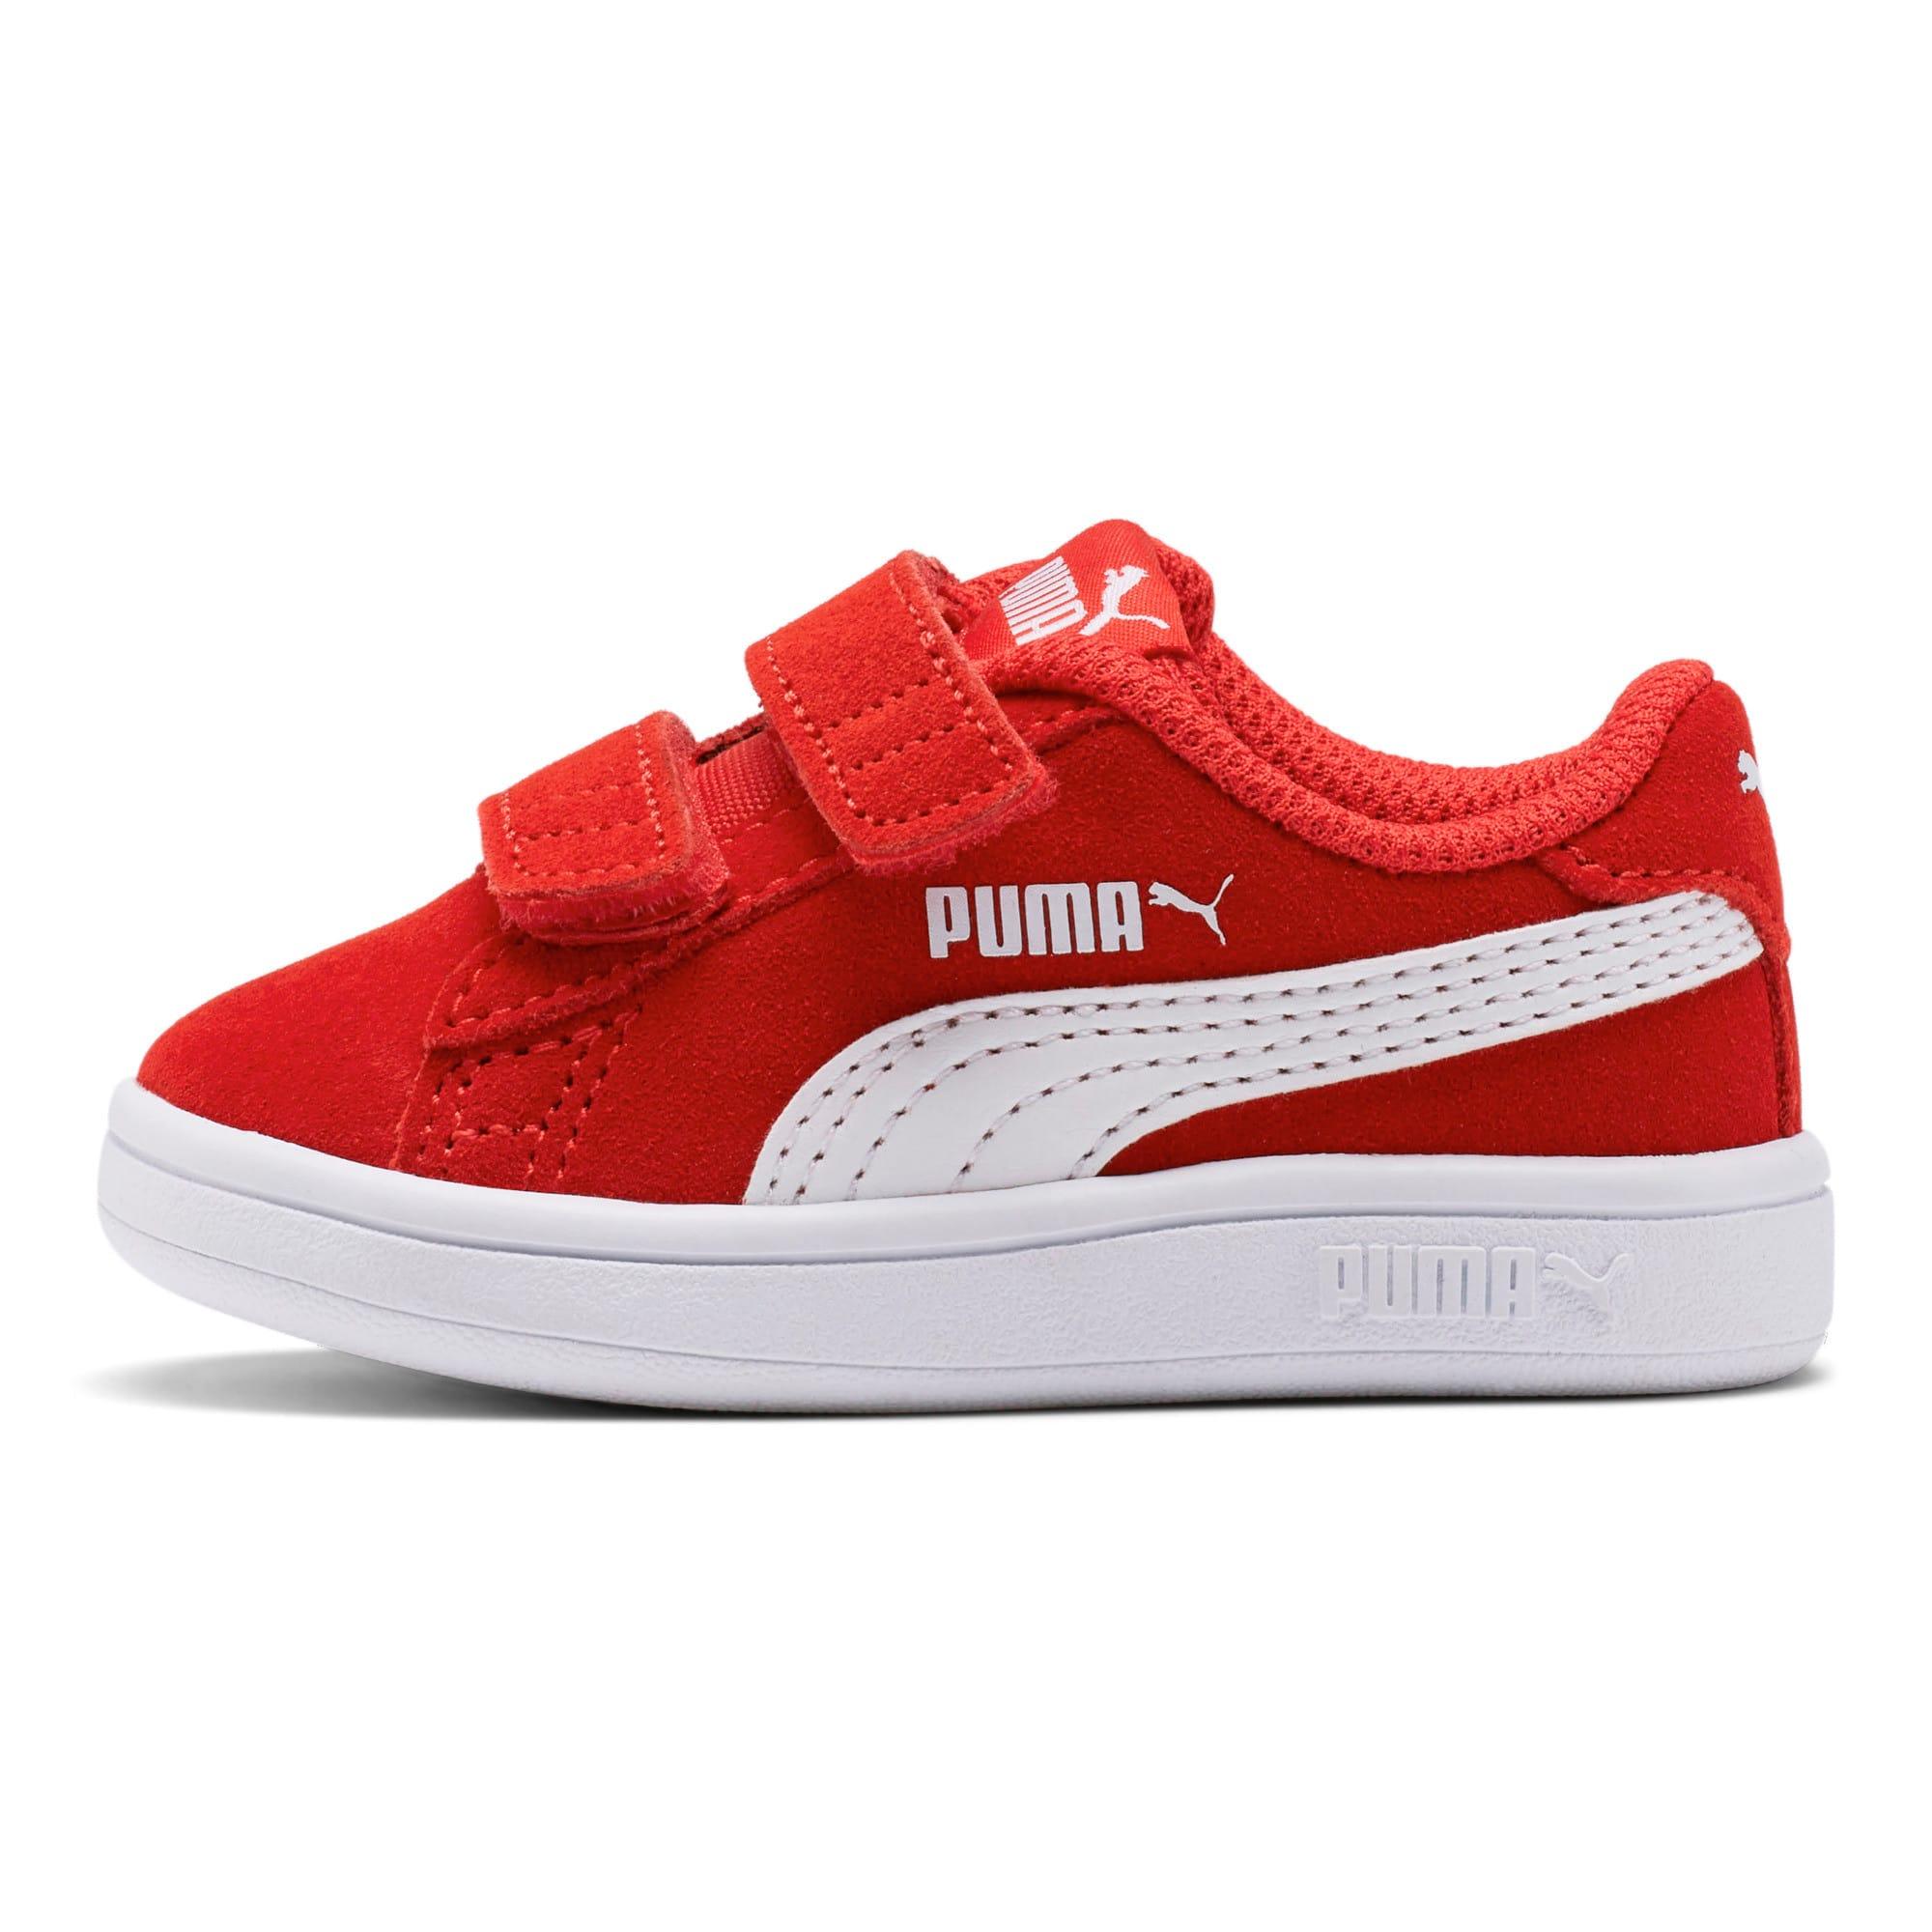 Thumbnail 1 of PUMA Smash v2 Suede Toddler Shoes, High Risk Red-Puma White, medium